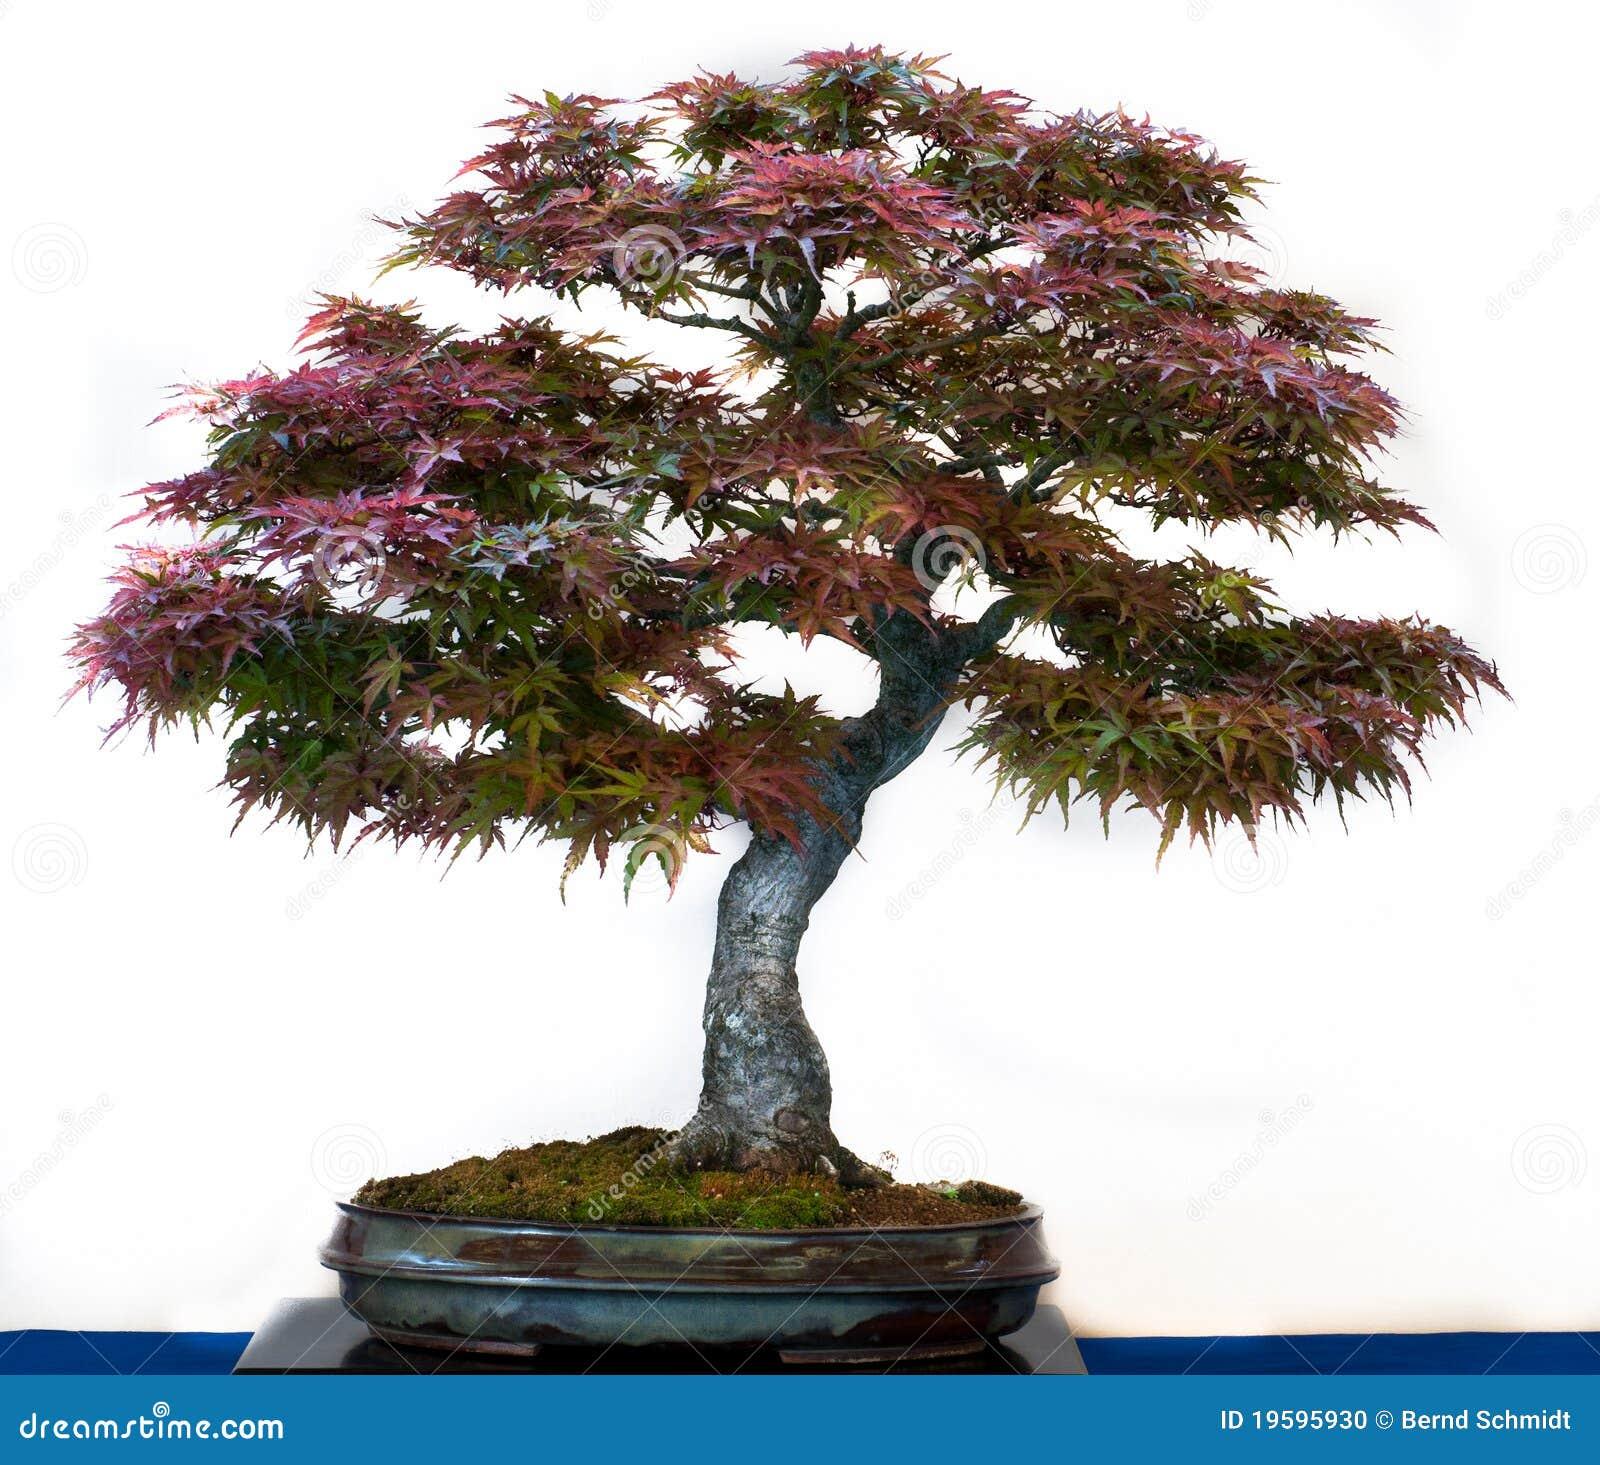 Acer Palmatum As Bonsai Tree Stock Photo Image Of Leaf Moss 19595930